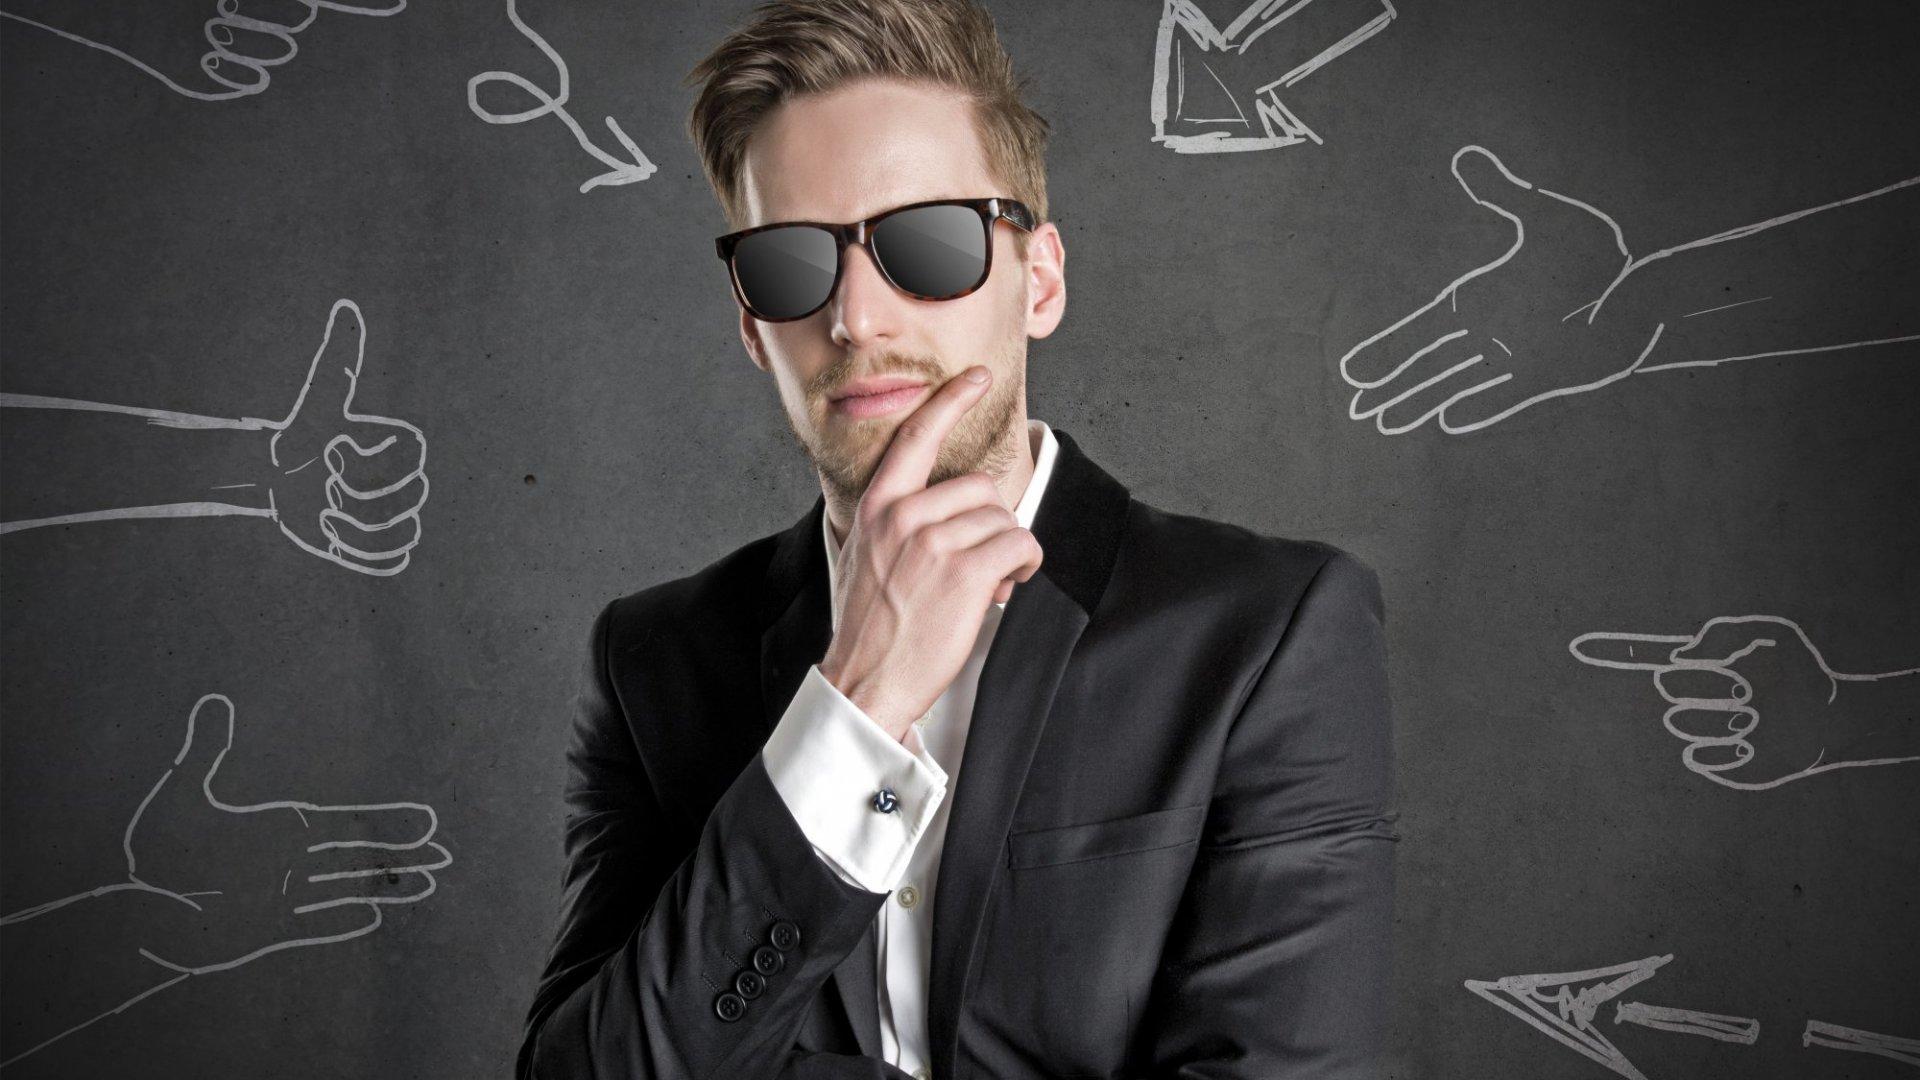 5 Mistakes Narcissistic Leaders Make